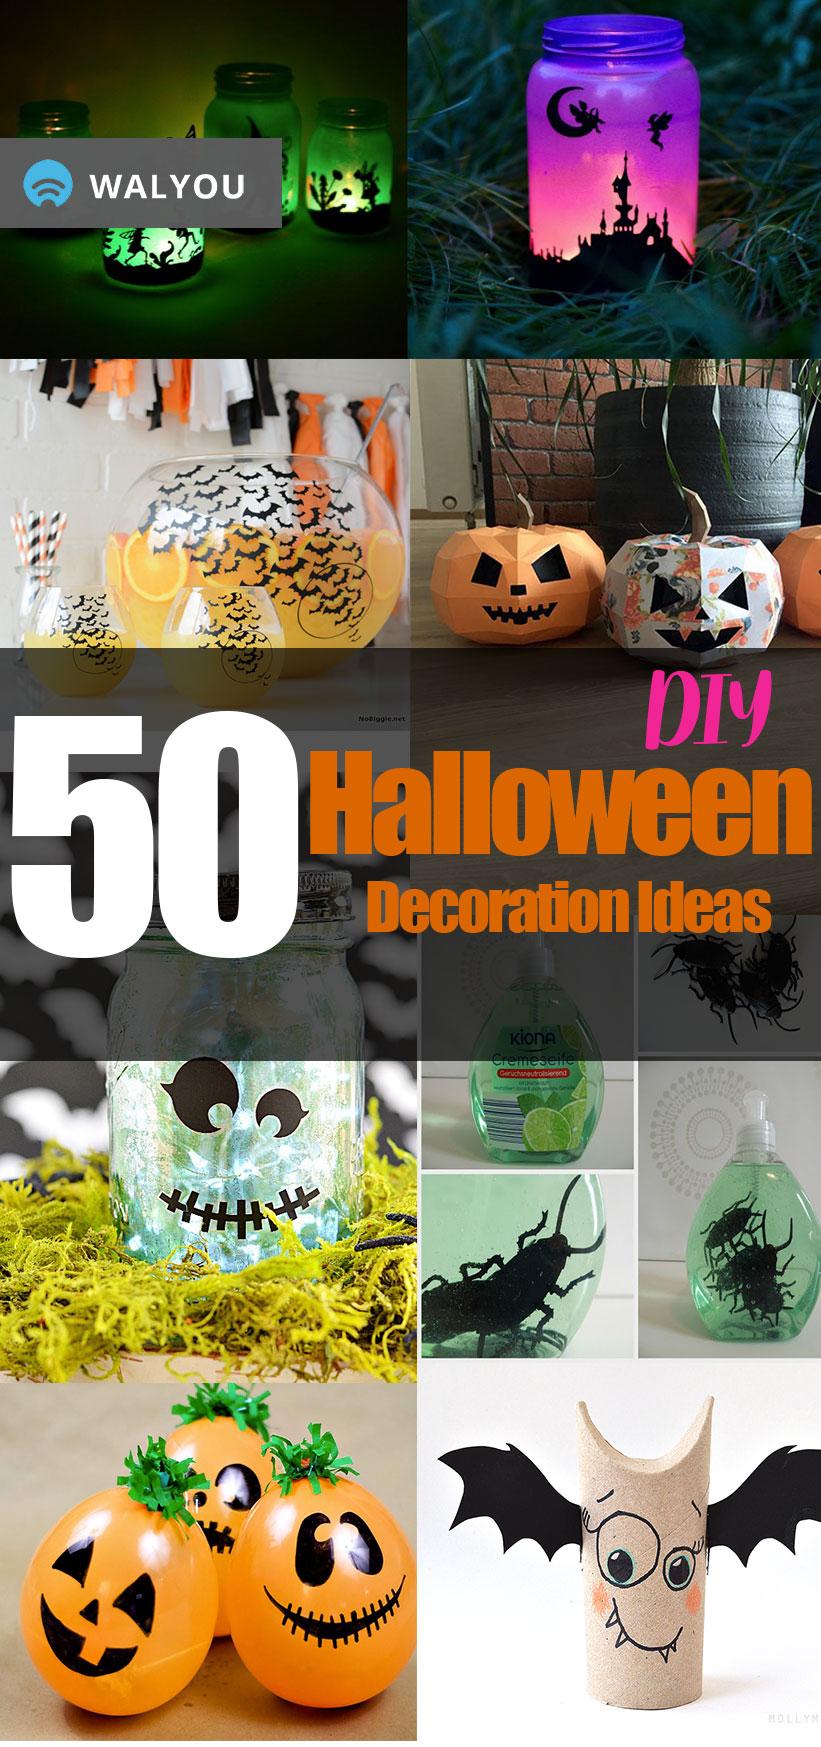 50 Easy Diy Halloween Decoration Ideas Walyou